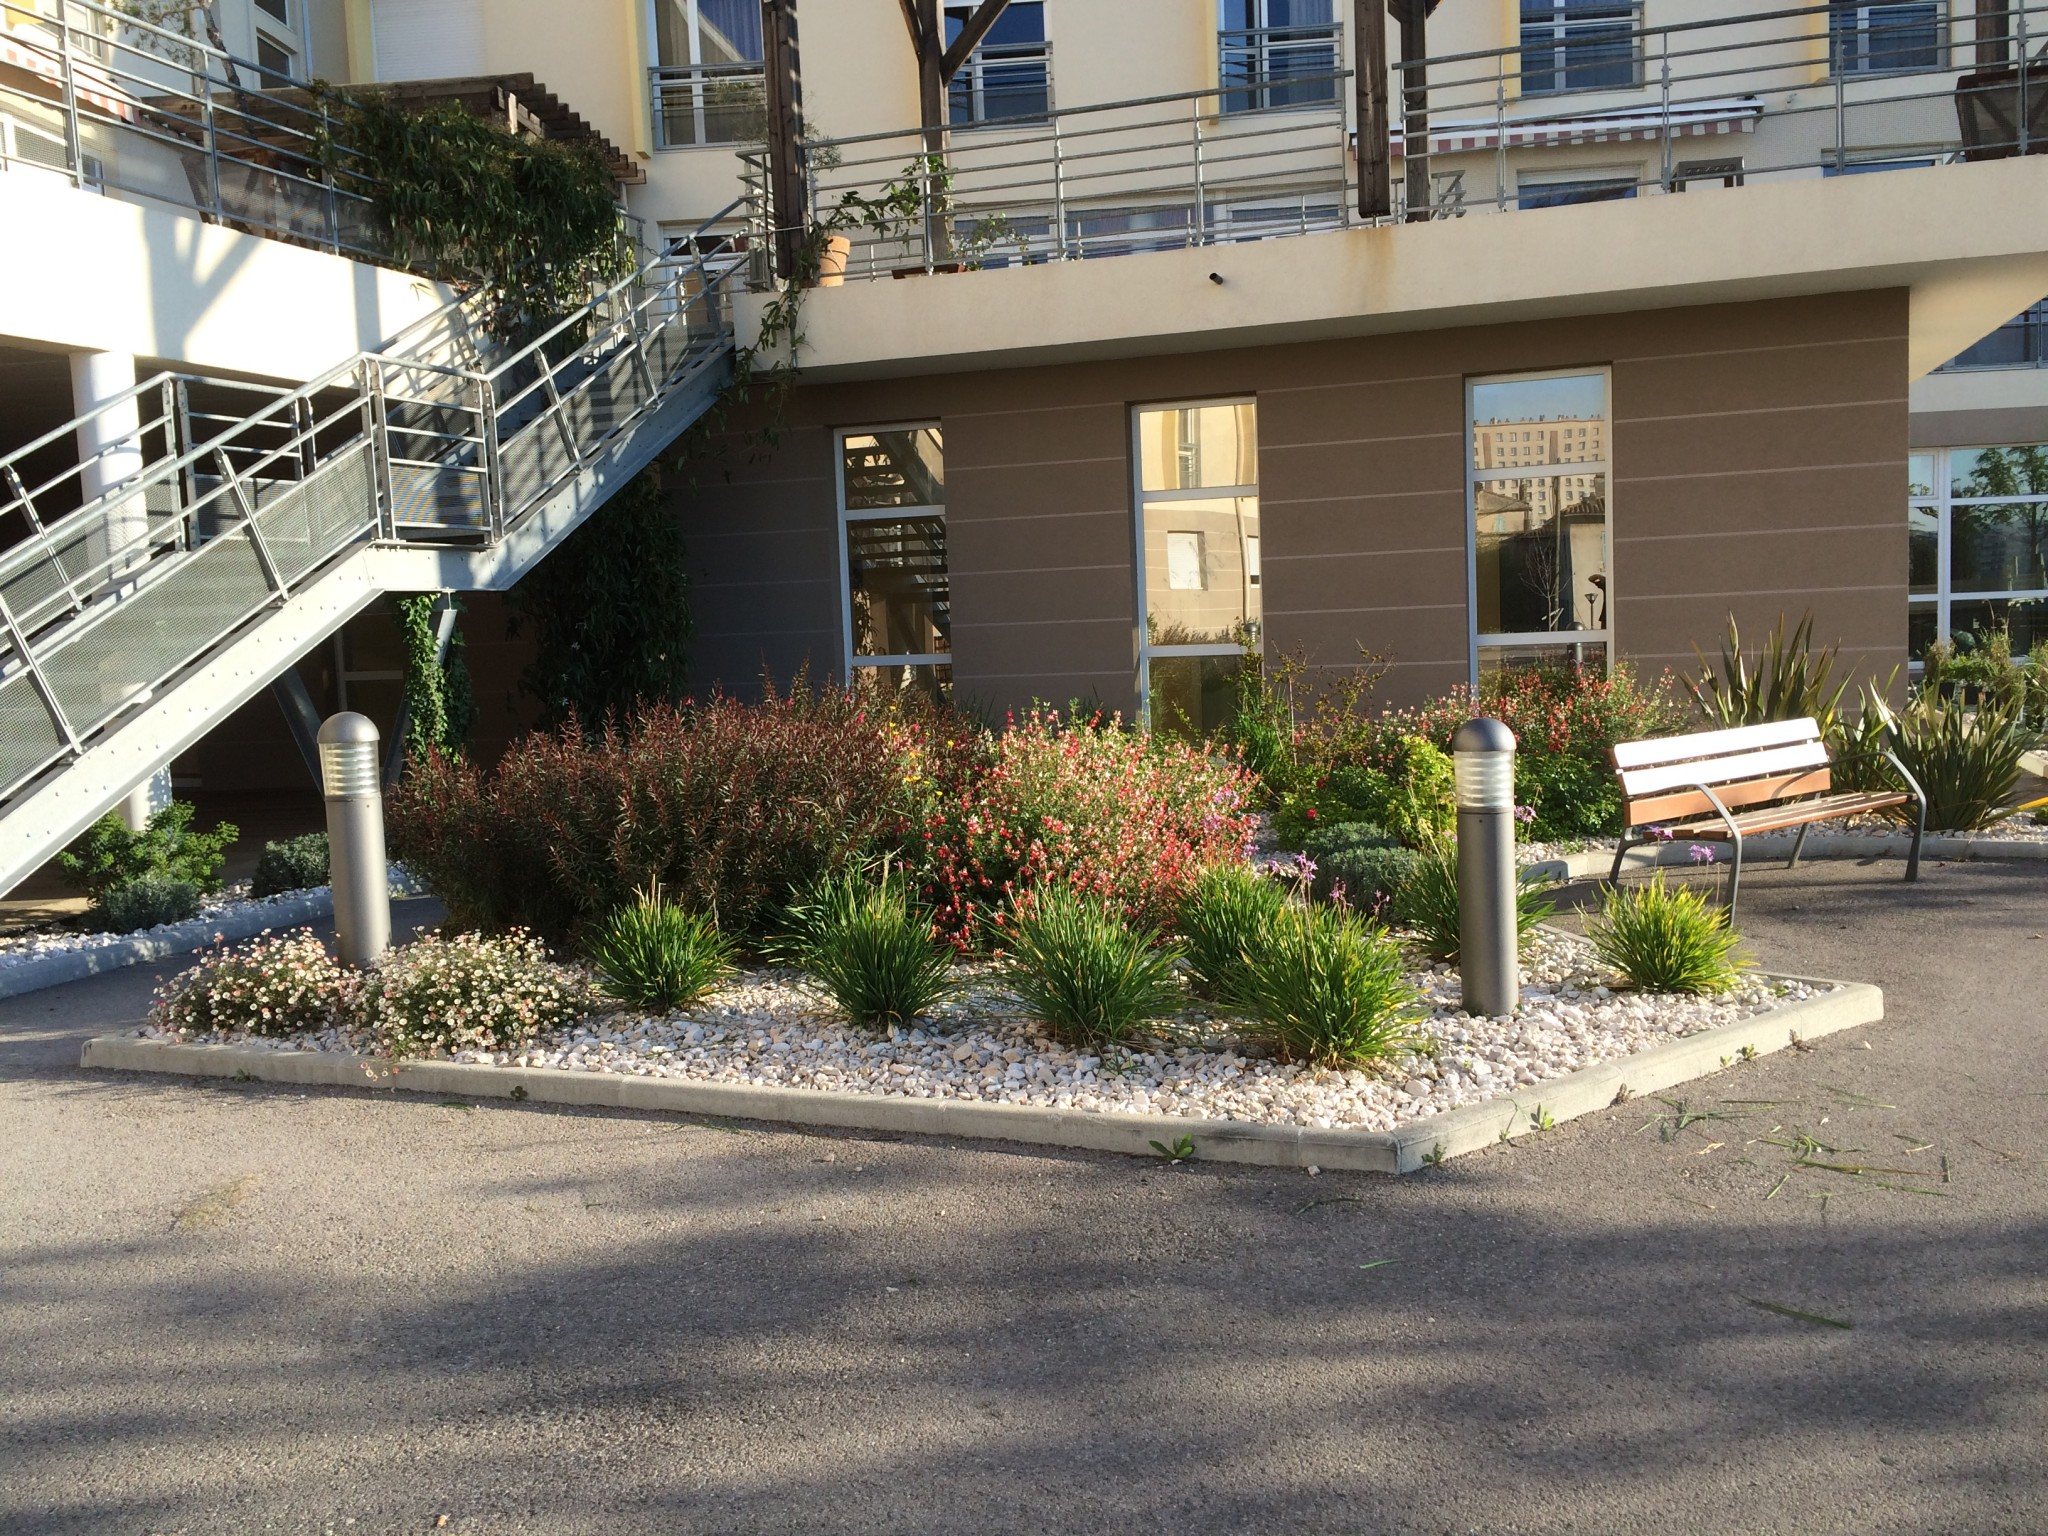 Jardinier paysagiste sur marseille for Entretien jardin marseille